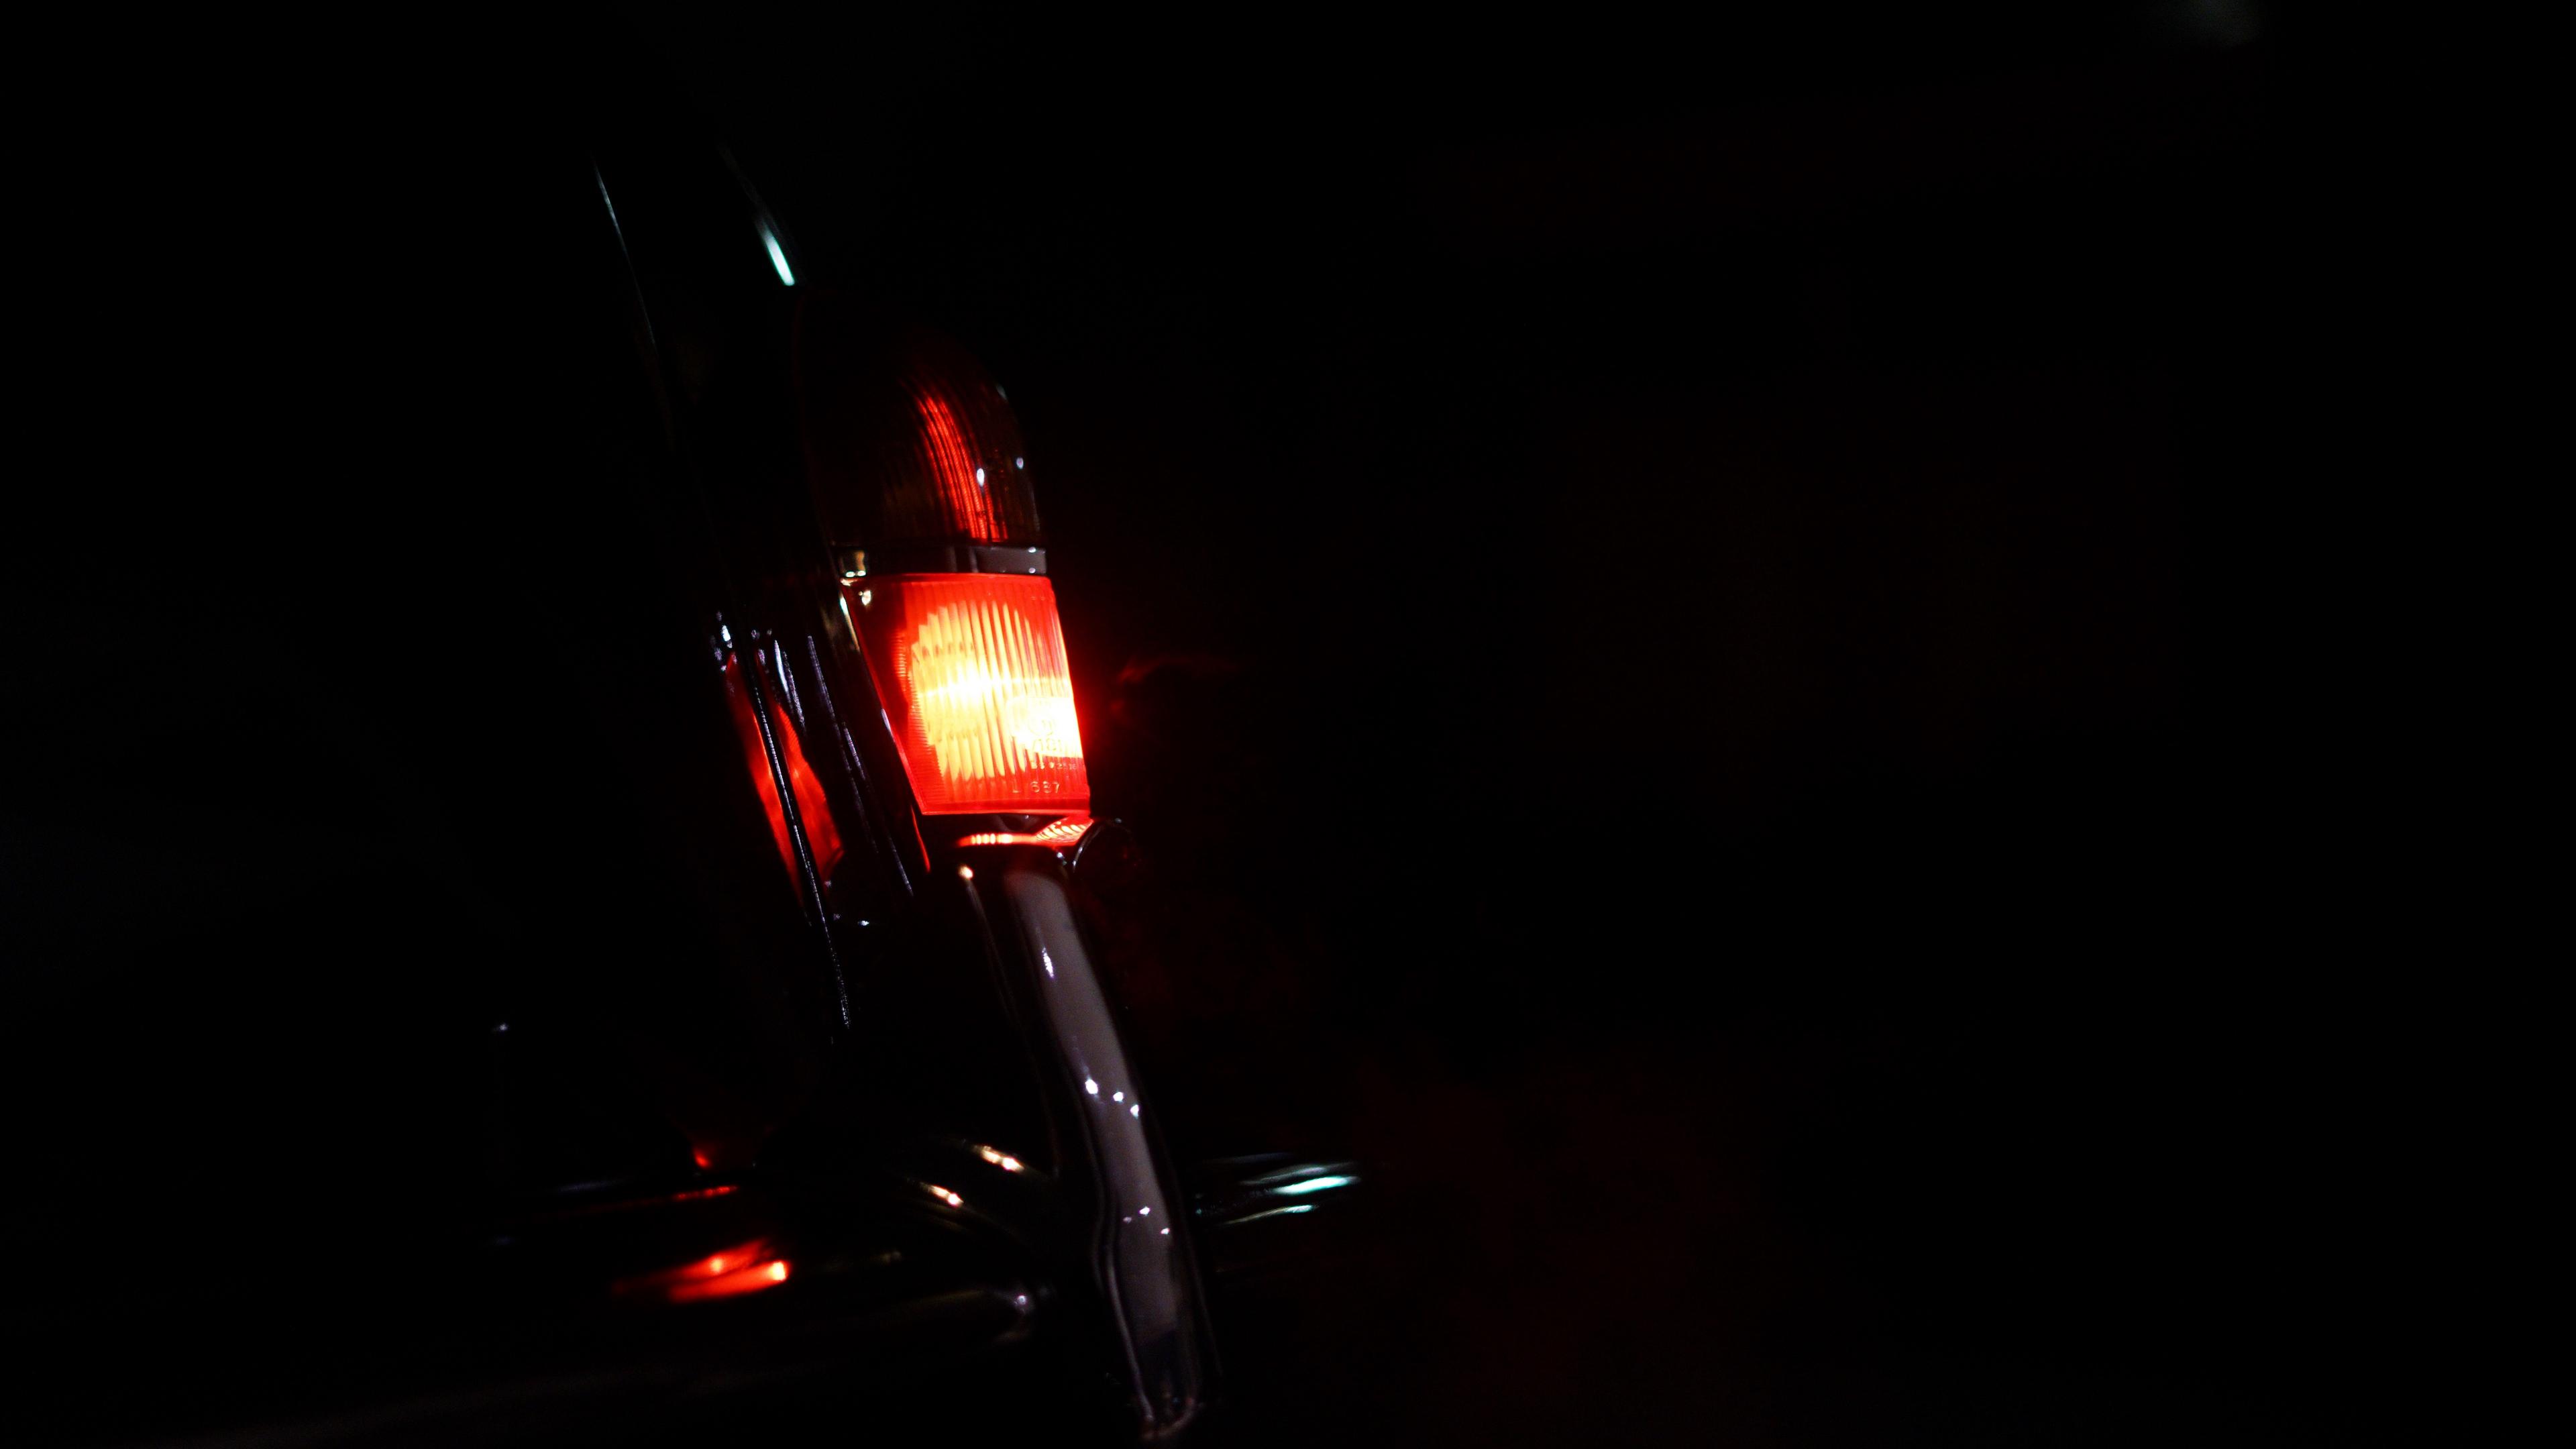 headlamp lighting light 4k 1540575071 - headlamp, lighting, light 4k - Lighting, Light, headlamp